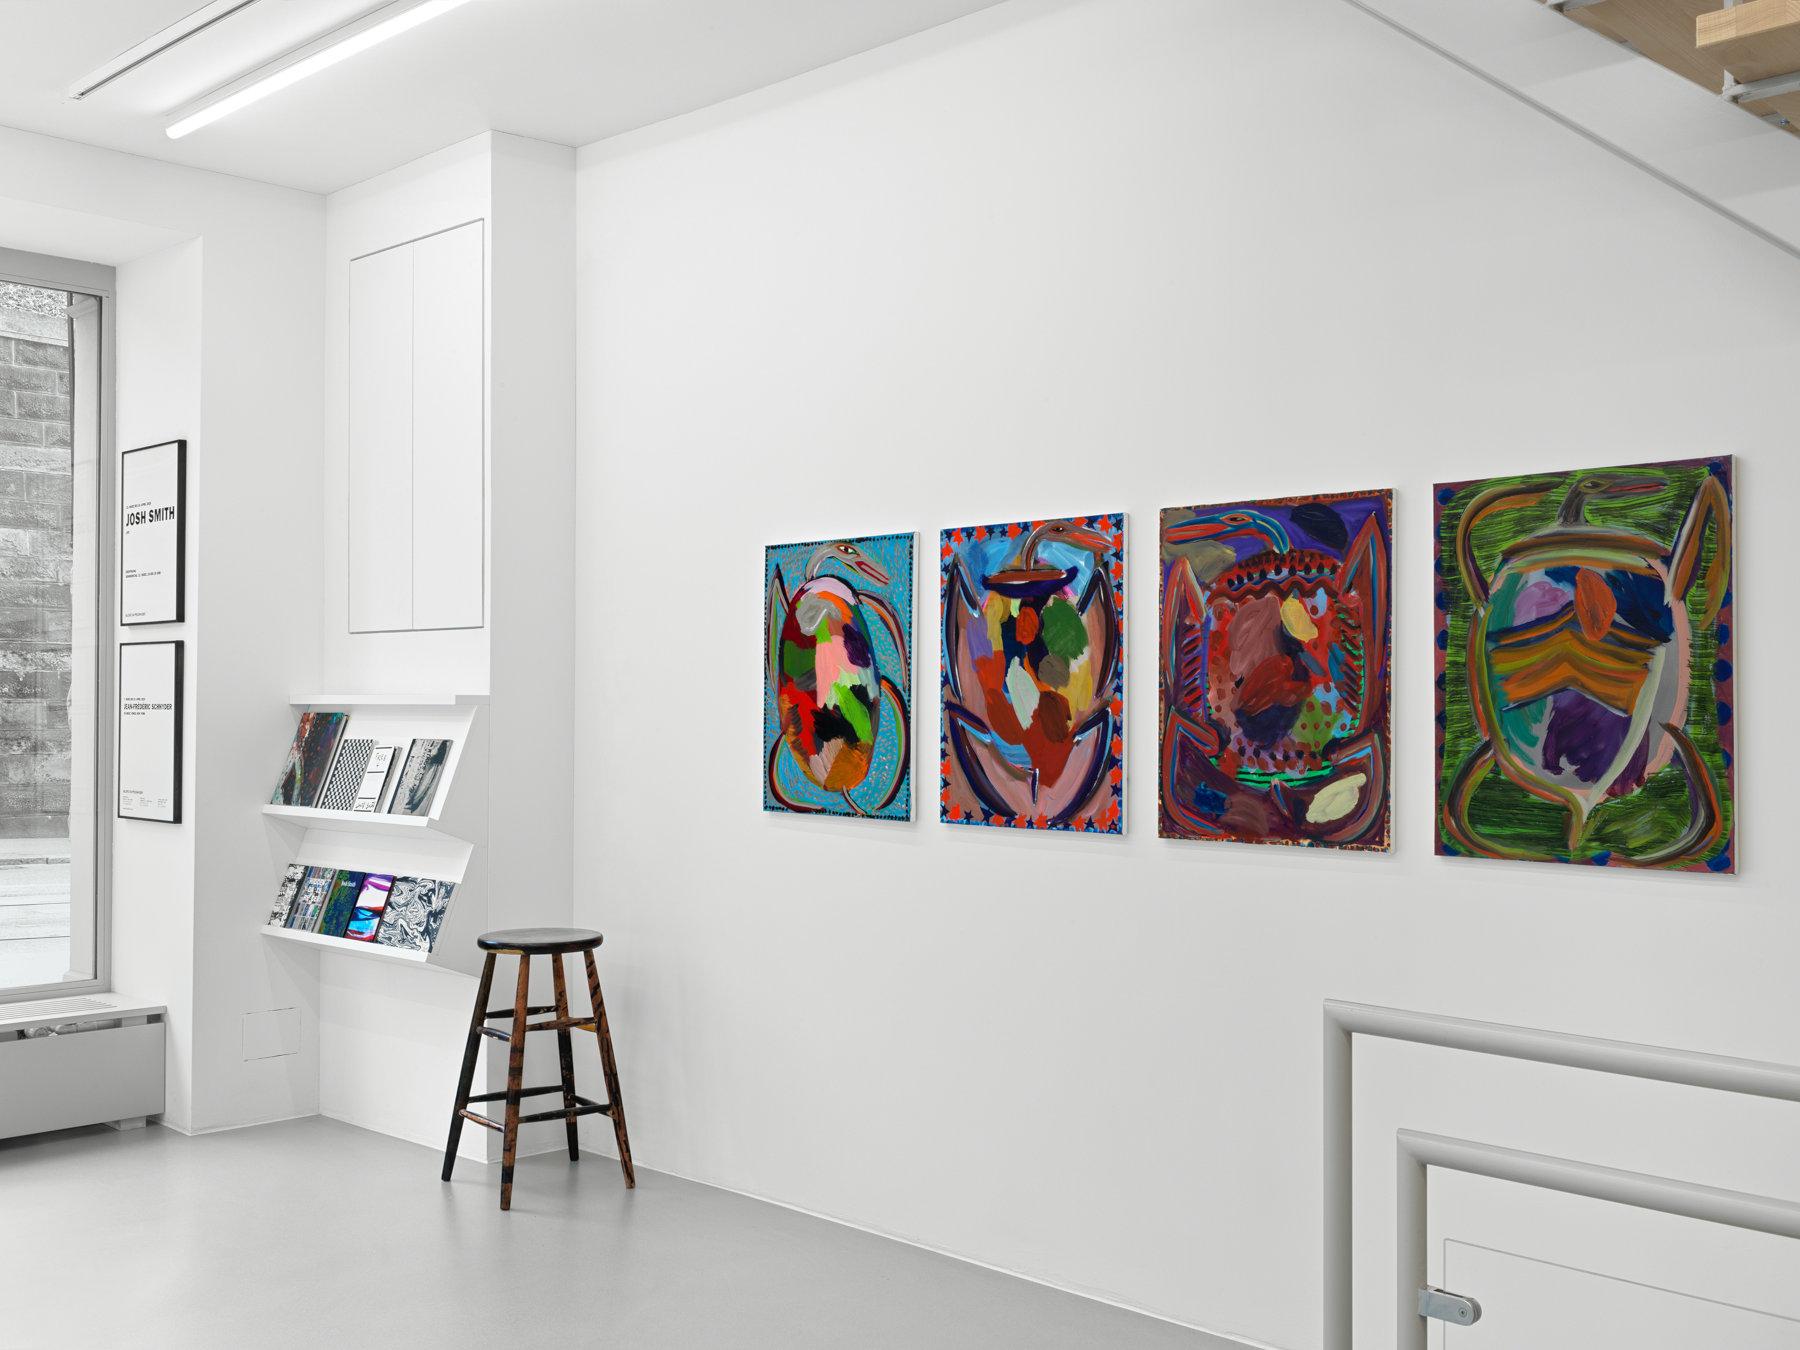 Galerie Eva Presenhuber Josh Smith 1